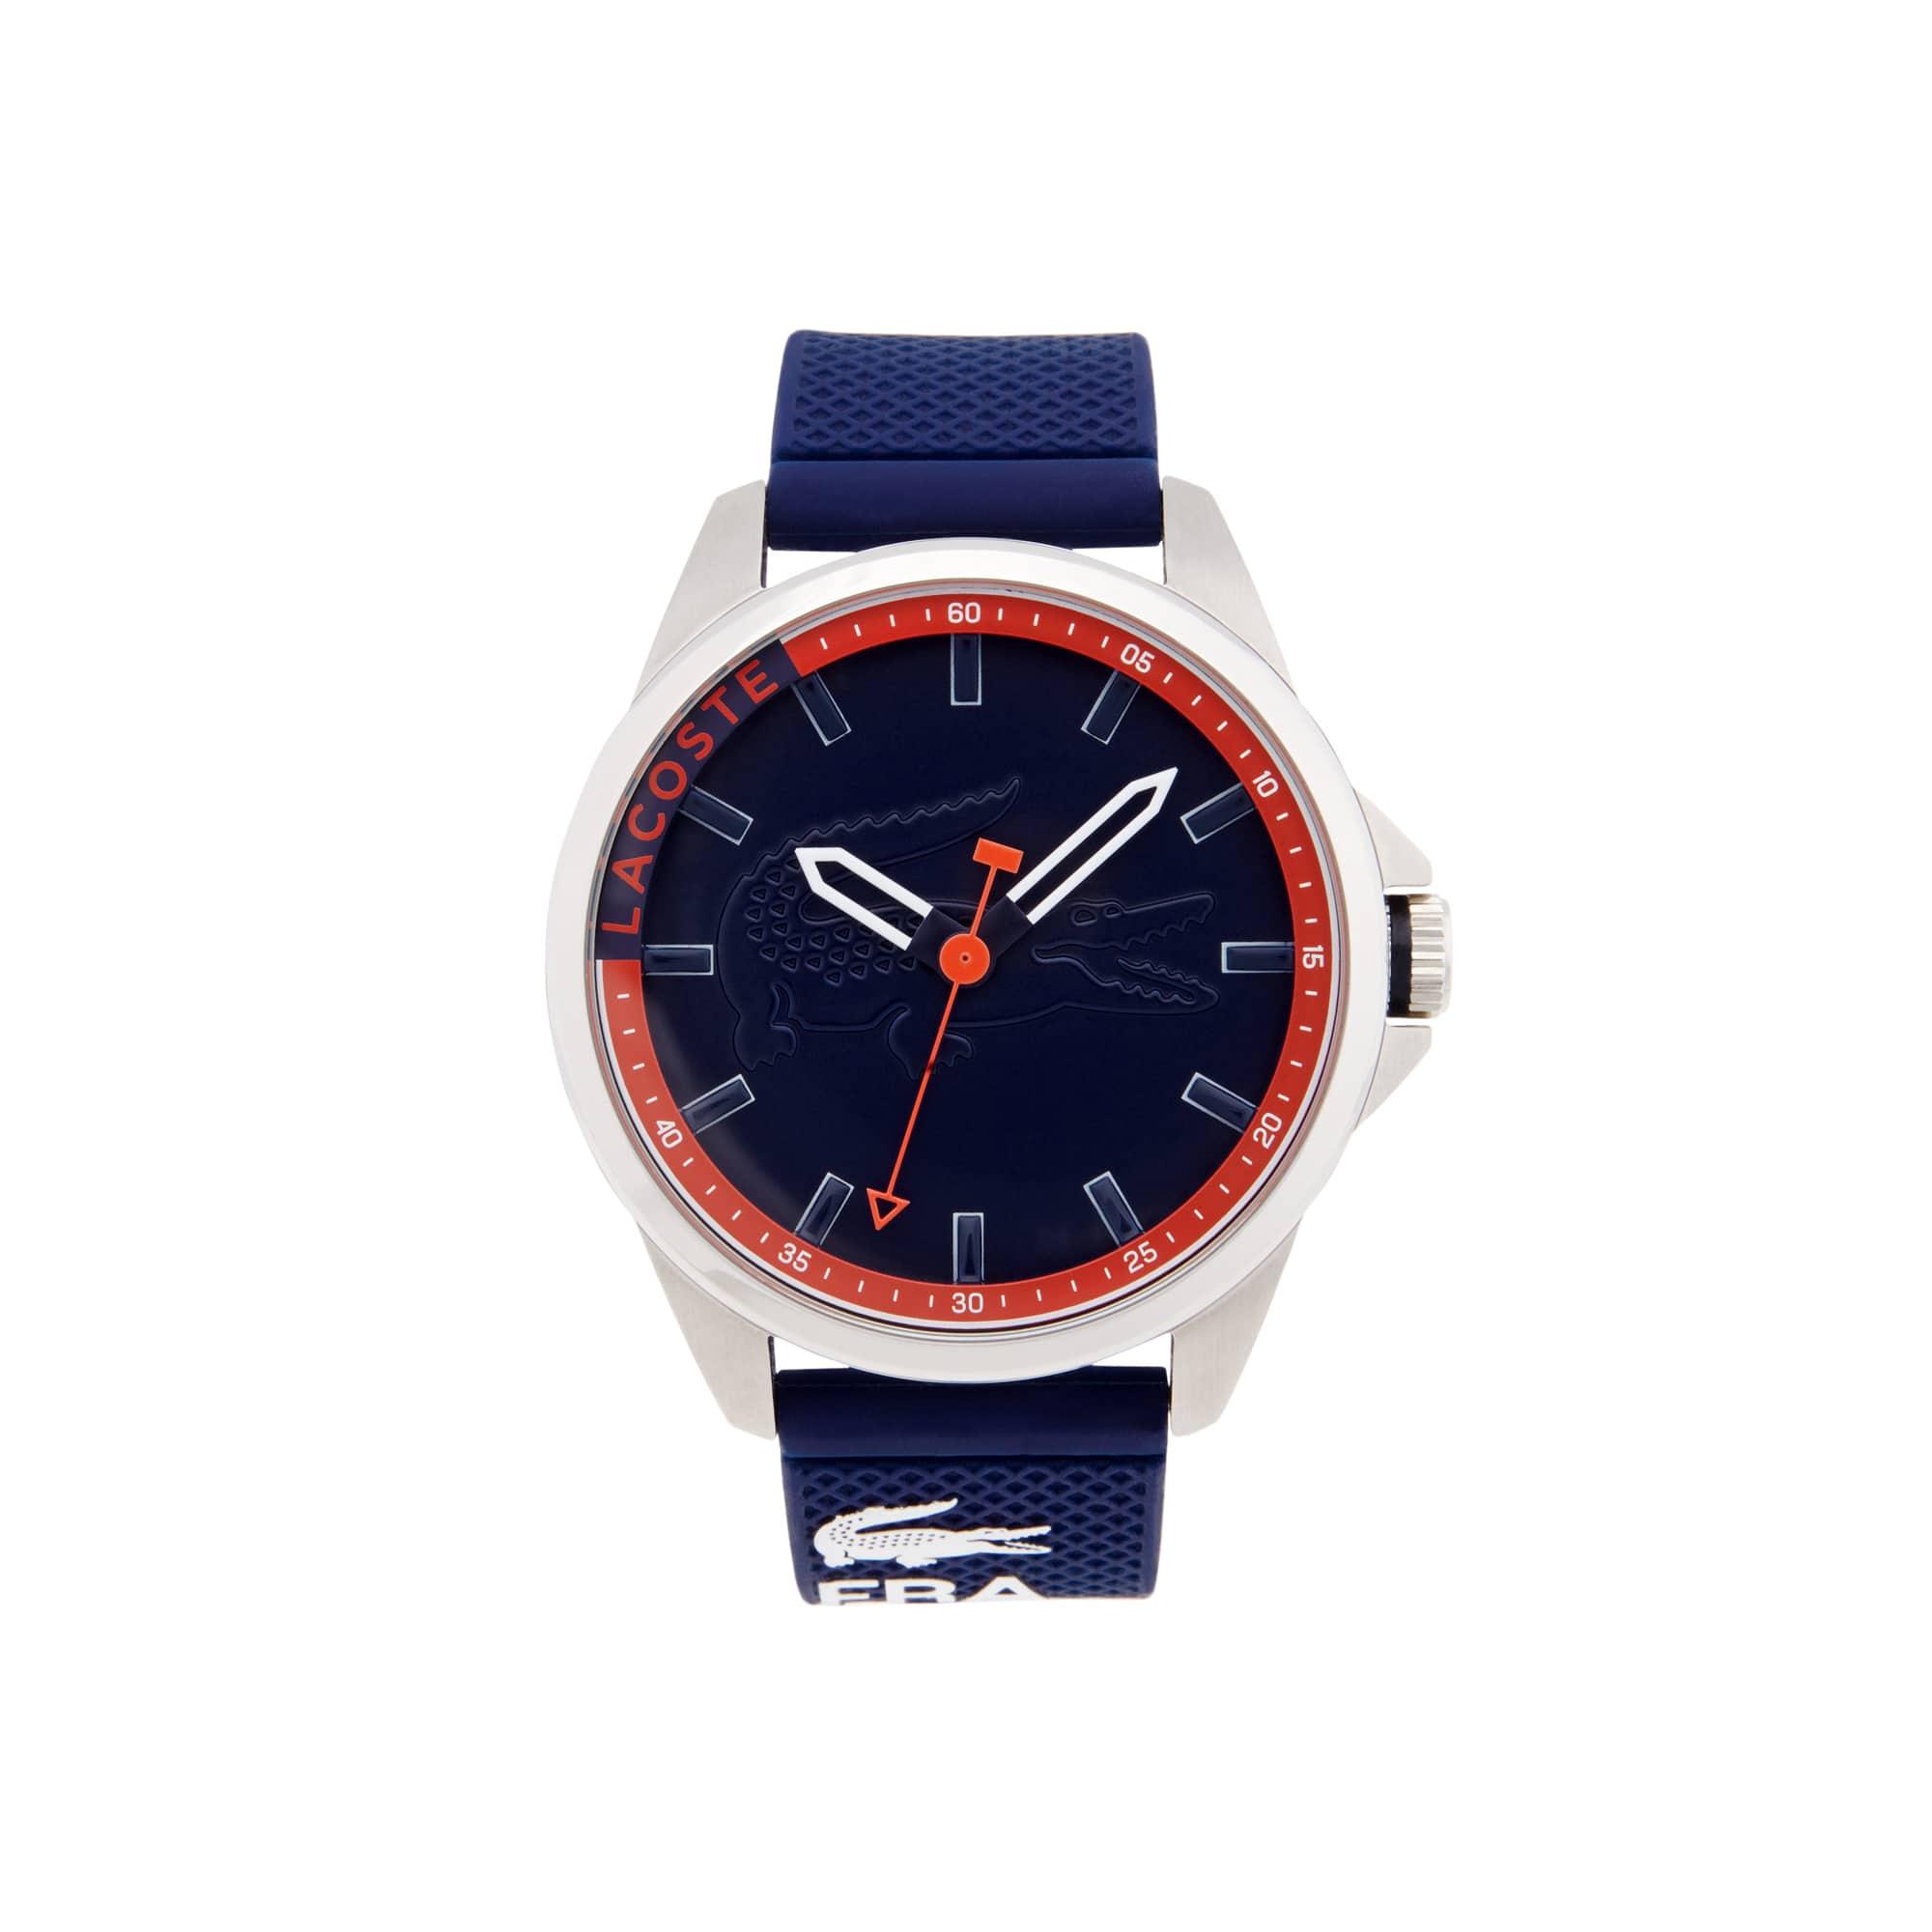 Uhr Capbreton mit weißem Silikonarmband